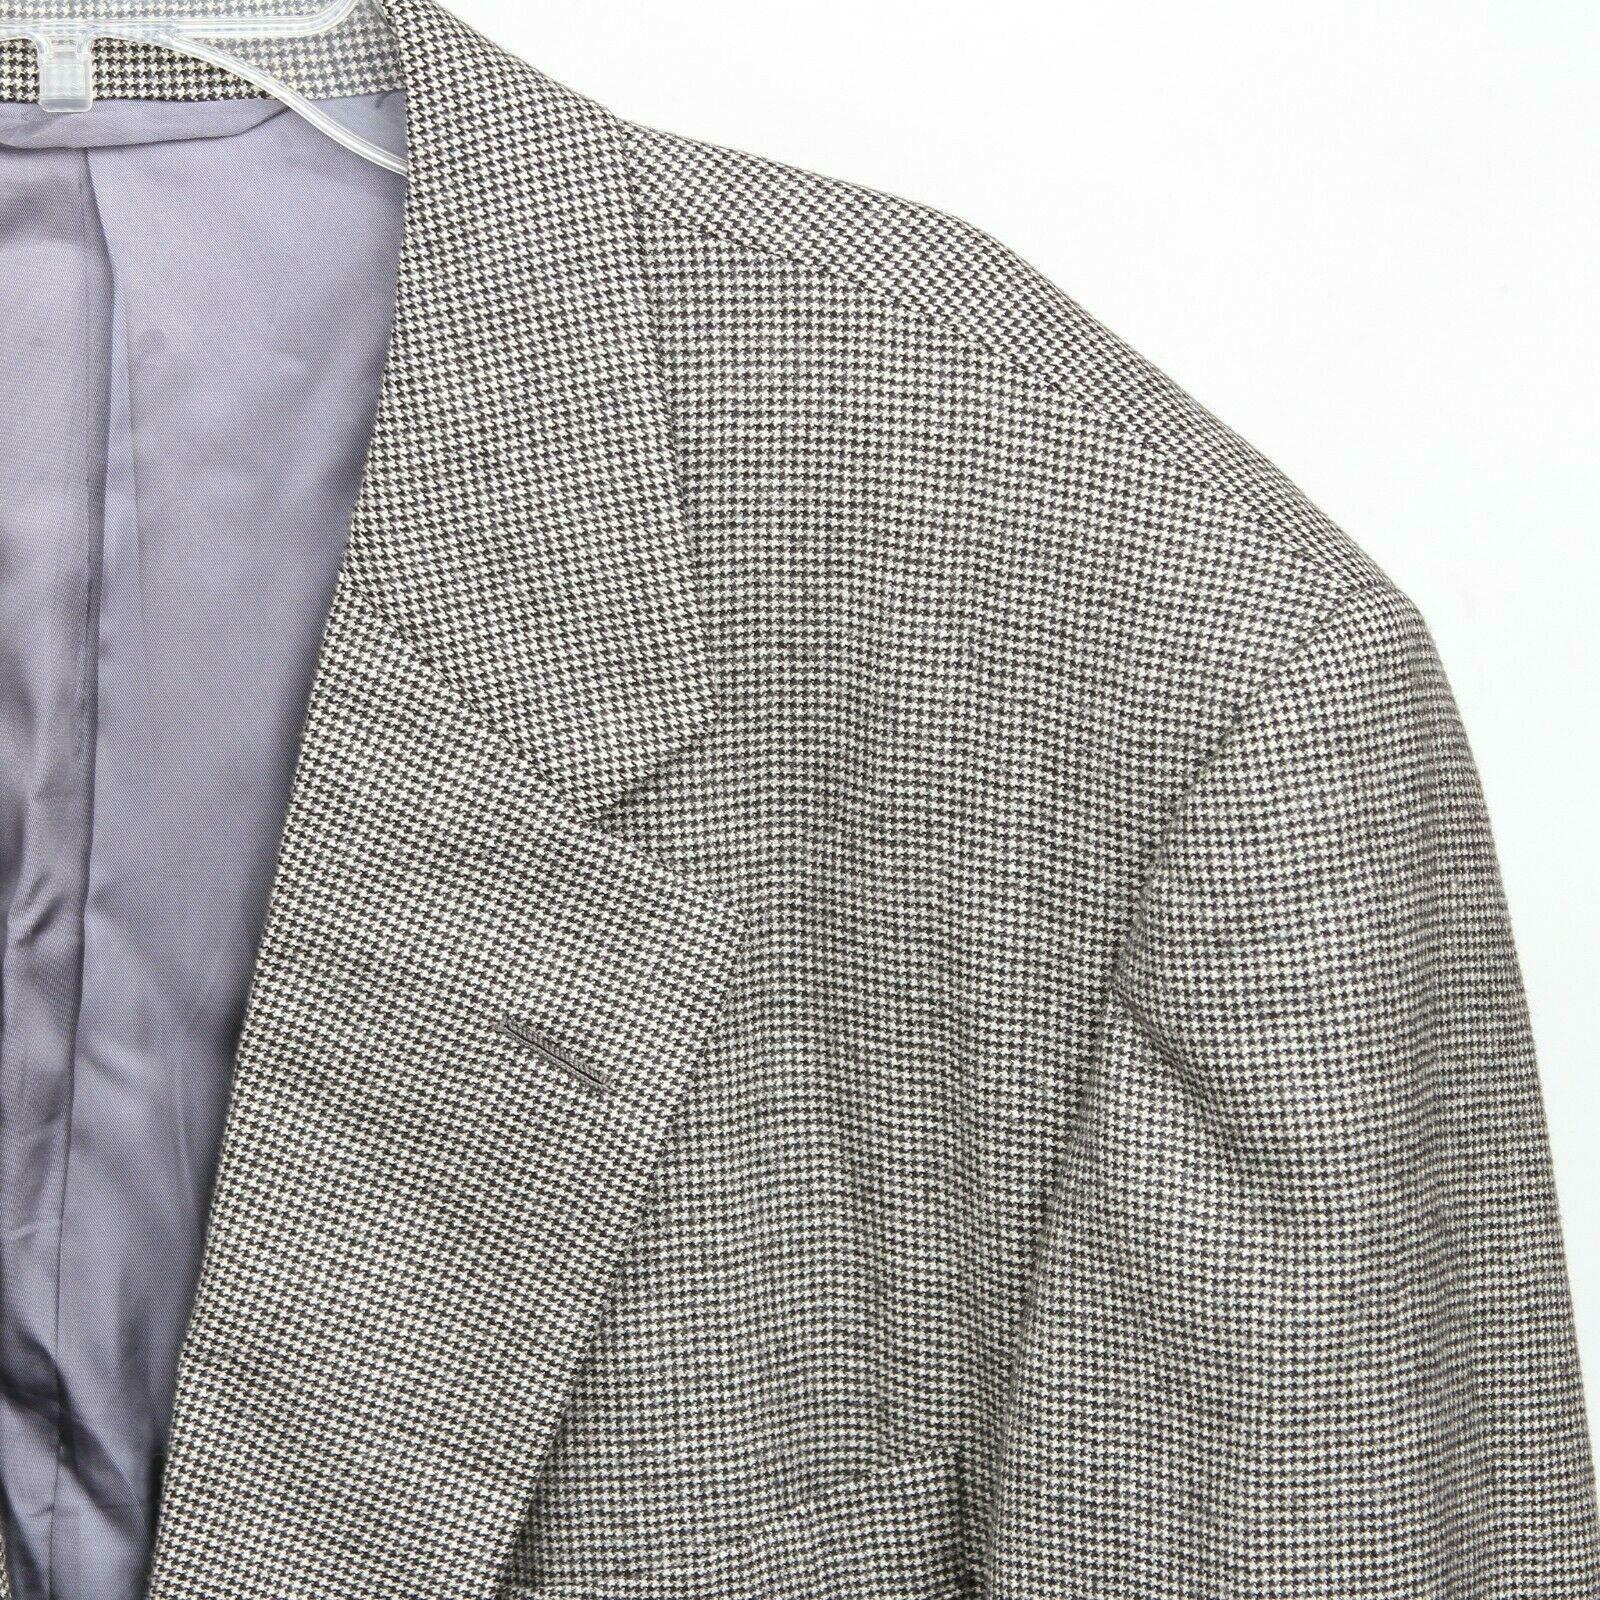 Hickey Freeman Paul Simon Gray White Black Wool H… - image 9